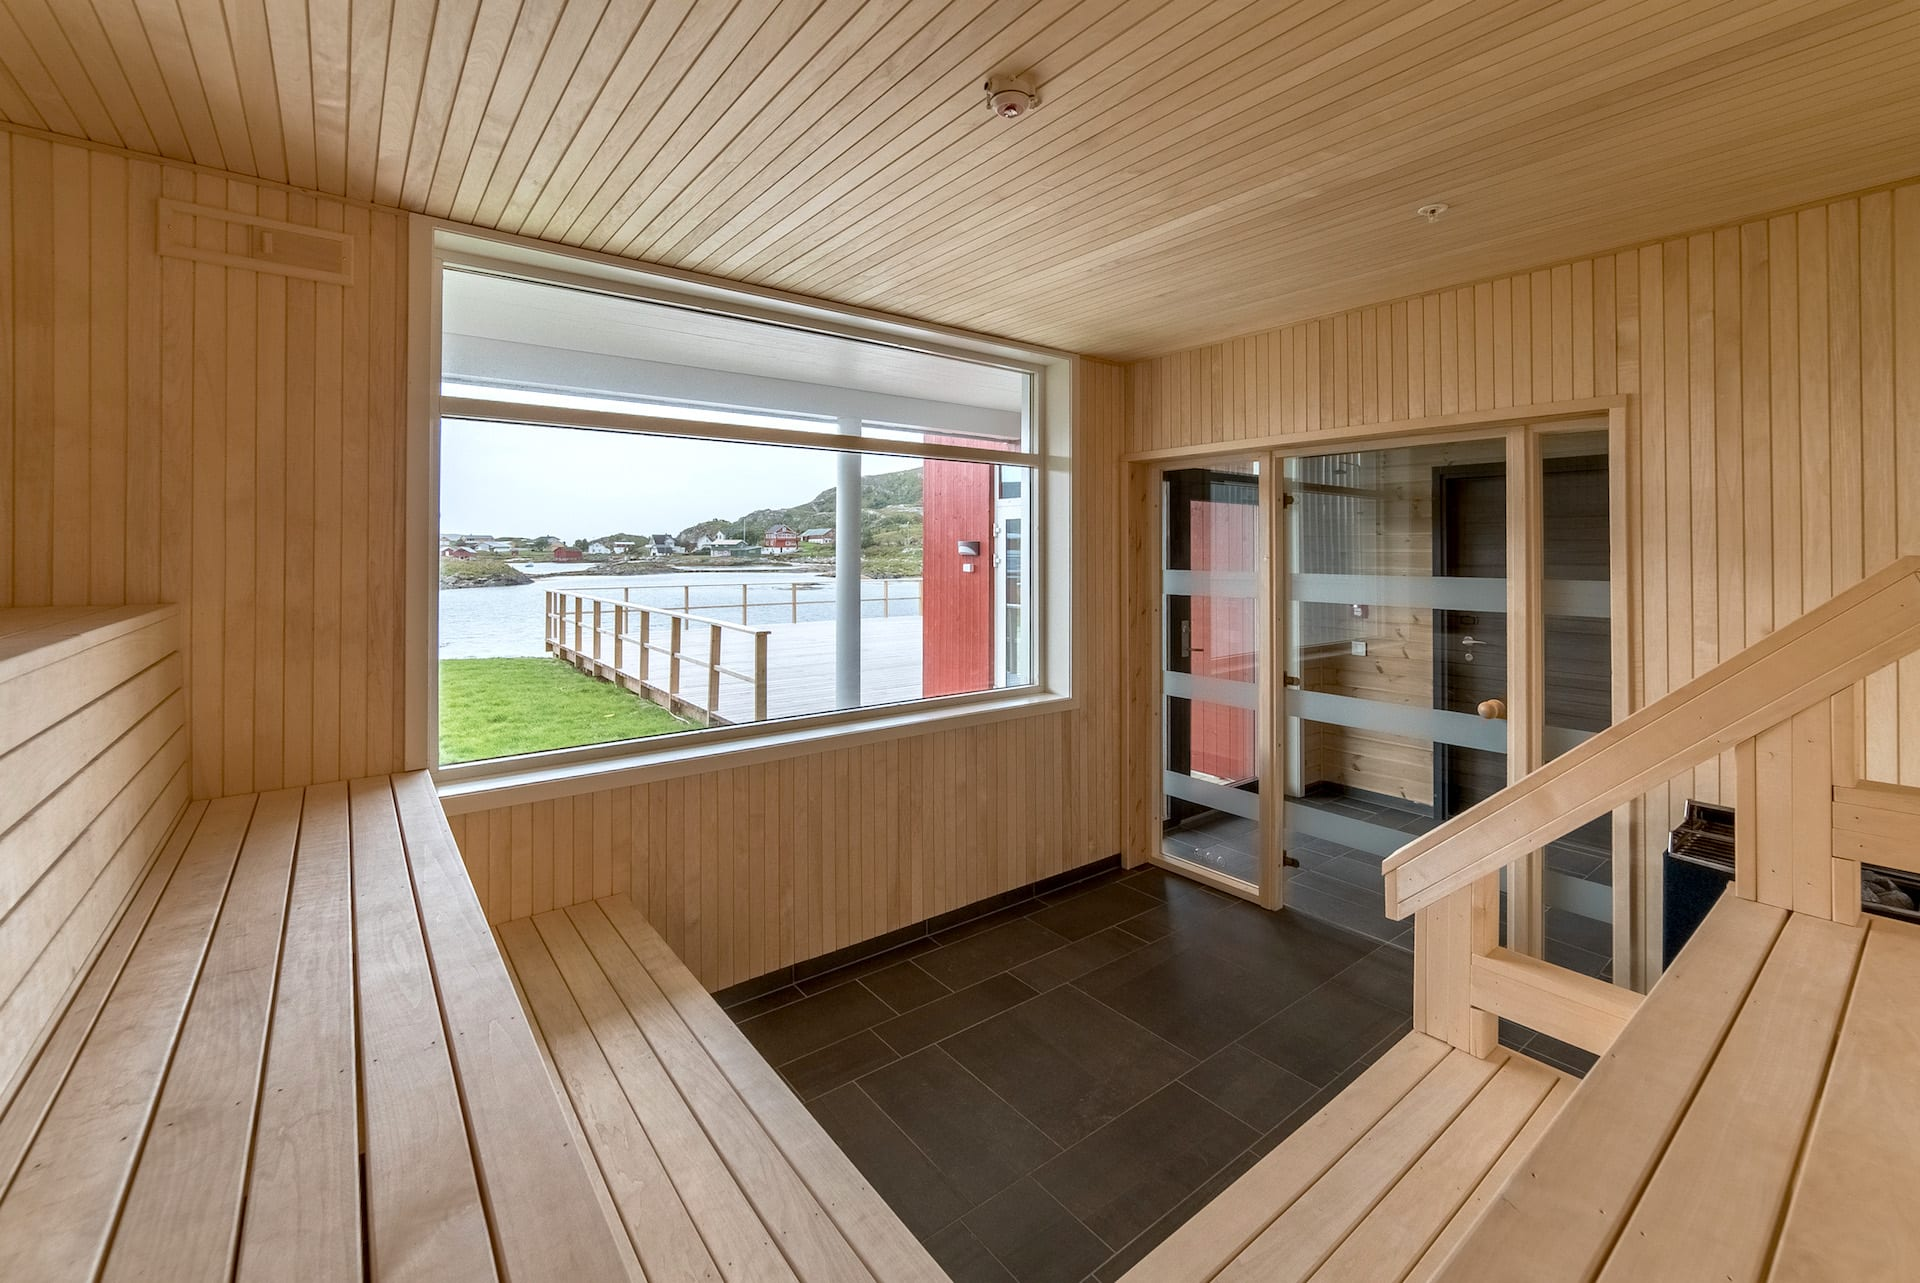 Sauna interior at Sommarøy Arctic Hotel in Sommarøy, near Tromsø, Arctic Norway